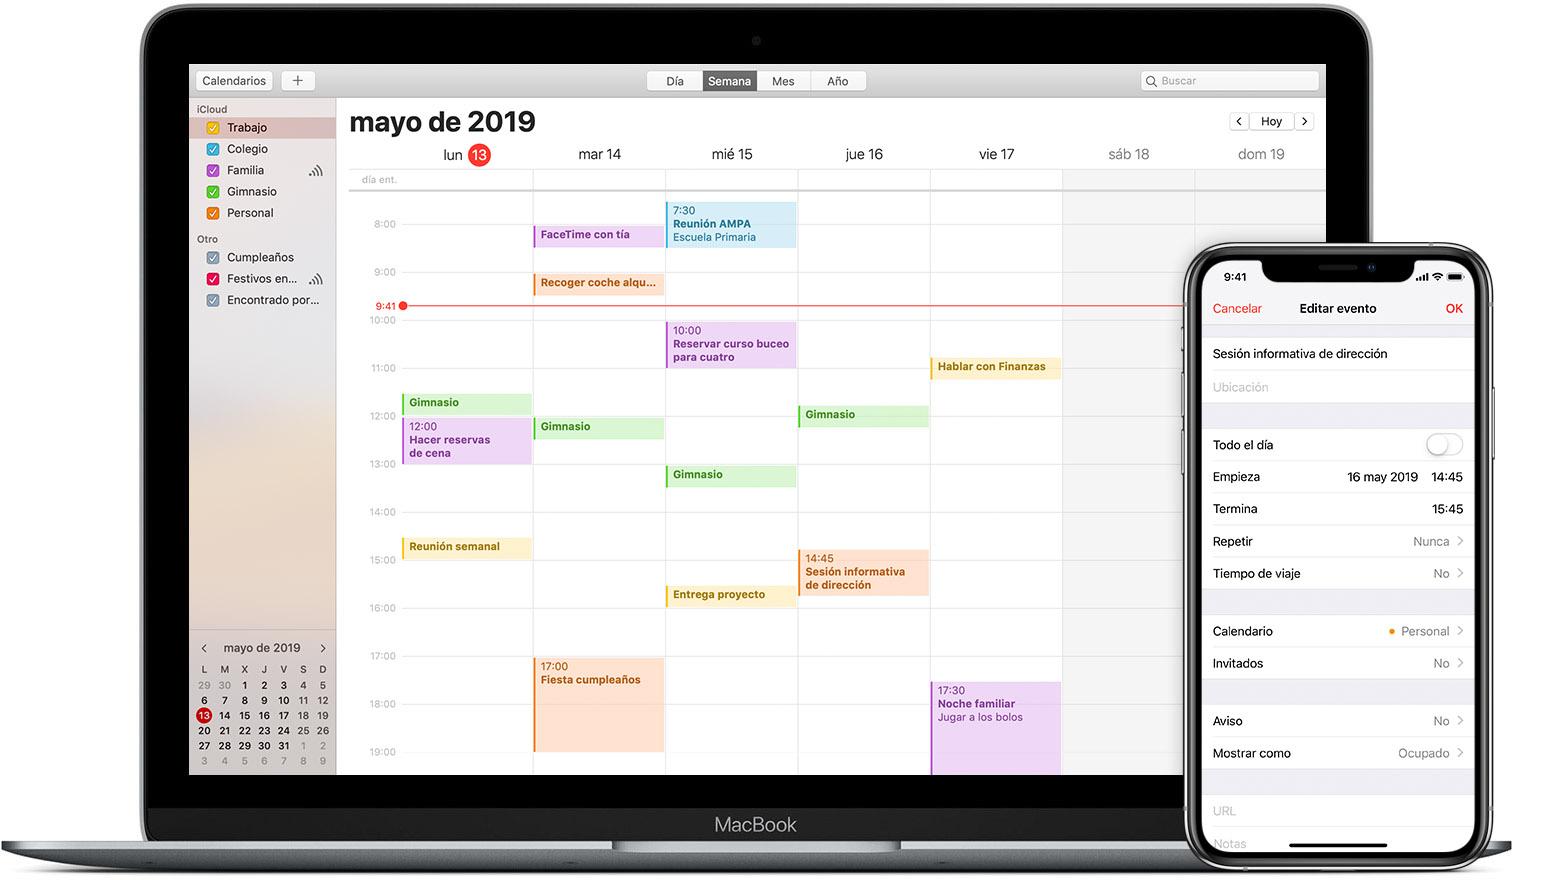 Abre Mi Calendario.Mantener Tu Calendario Actualizado Con Icloud Soporte